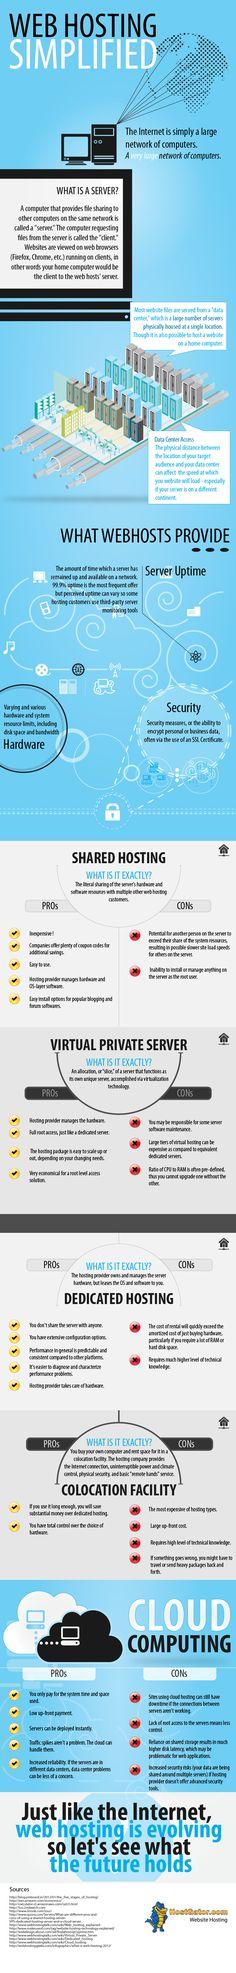 Alojamiento web simplificado #infografia #infographic #internet